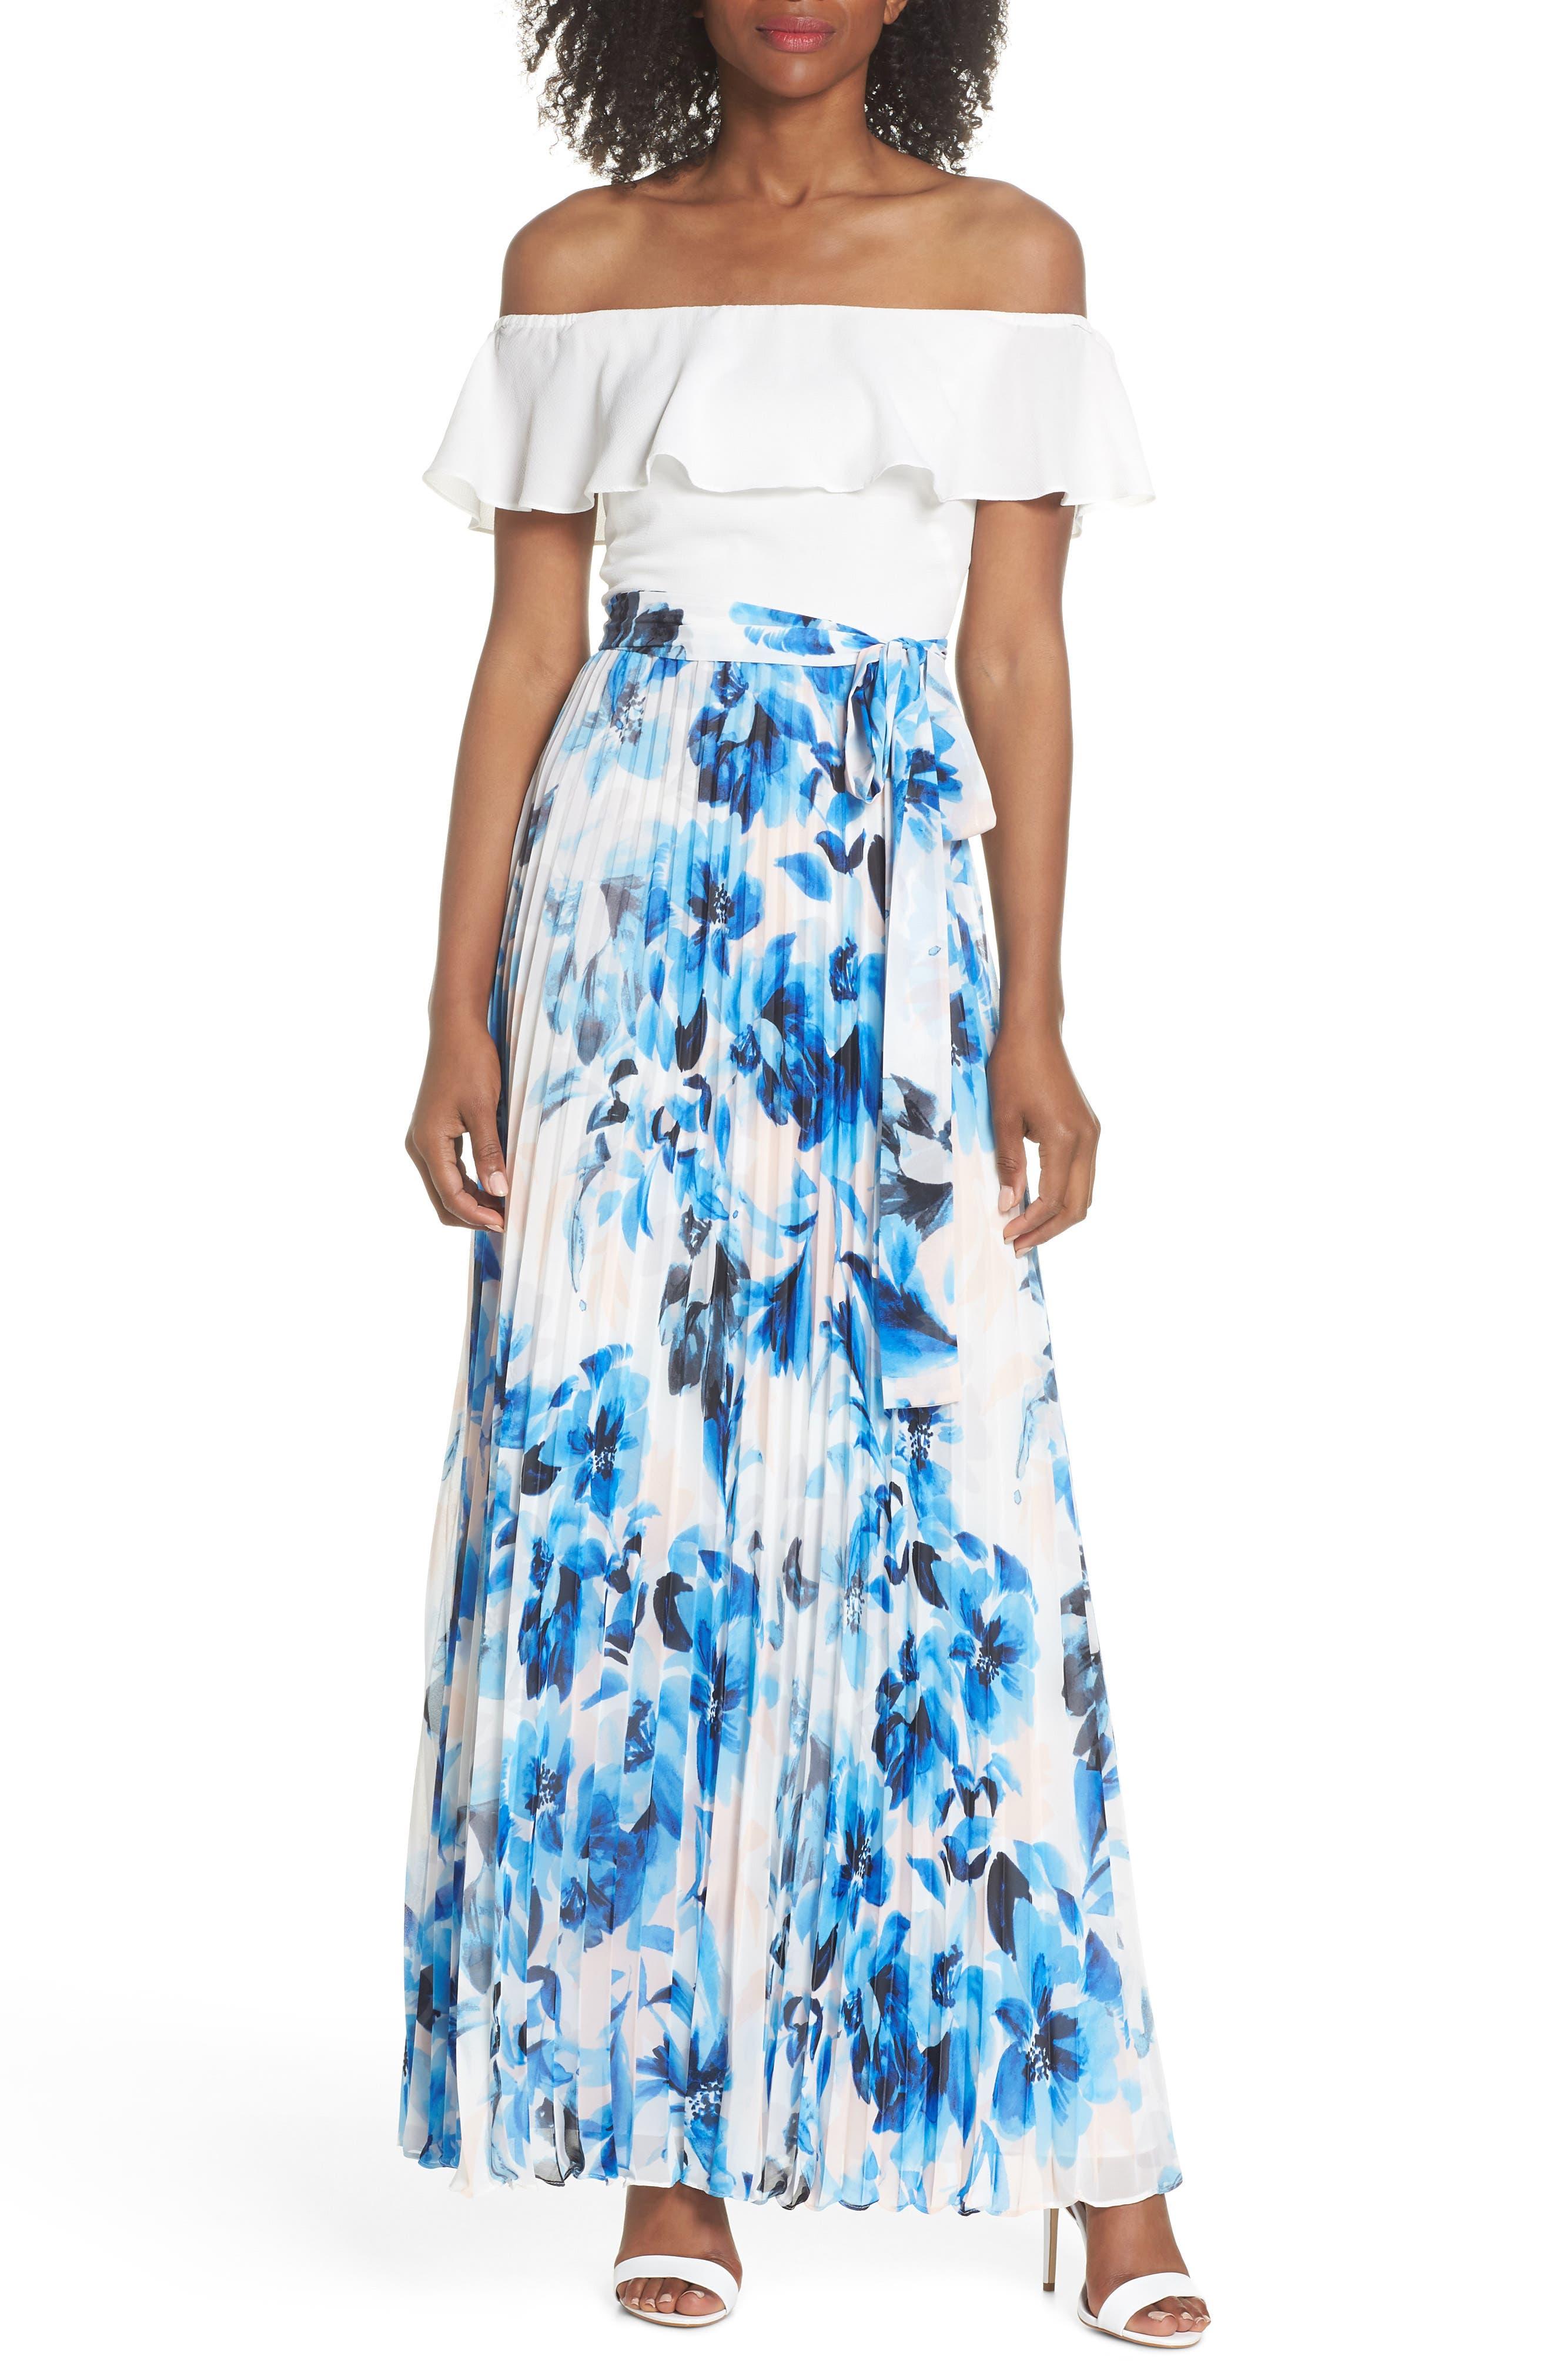 Ruffle Off the Shoulder Maxi Dress,                             Main thumbnail 1, color,                             Blue